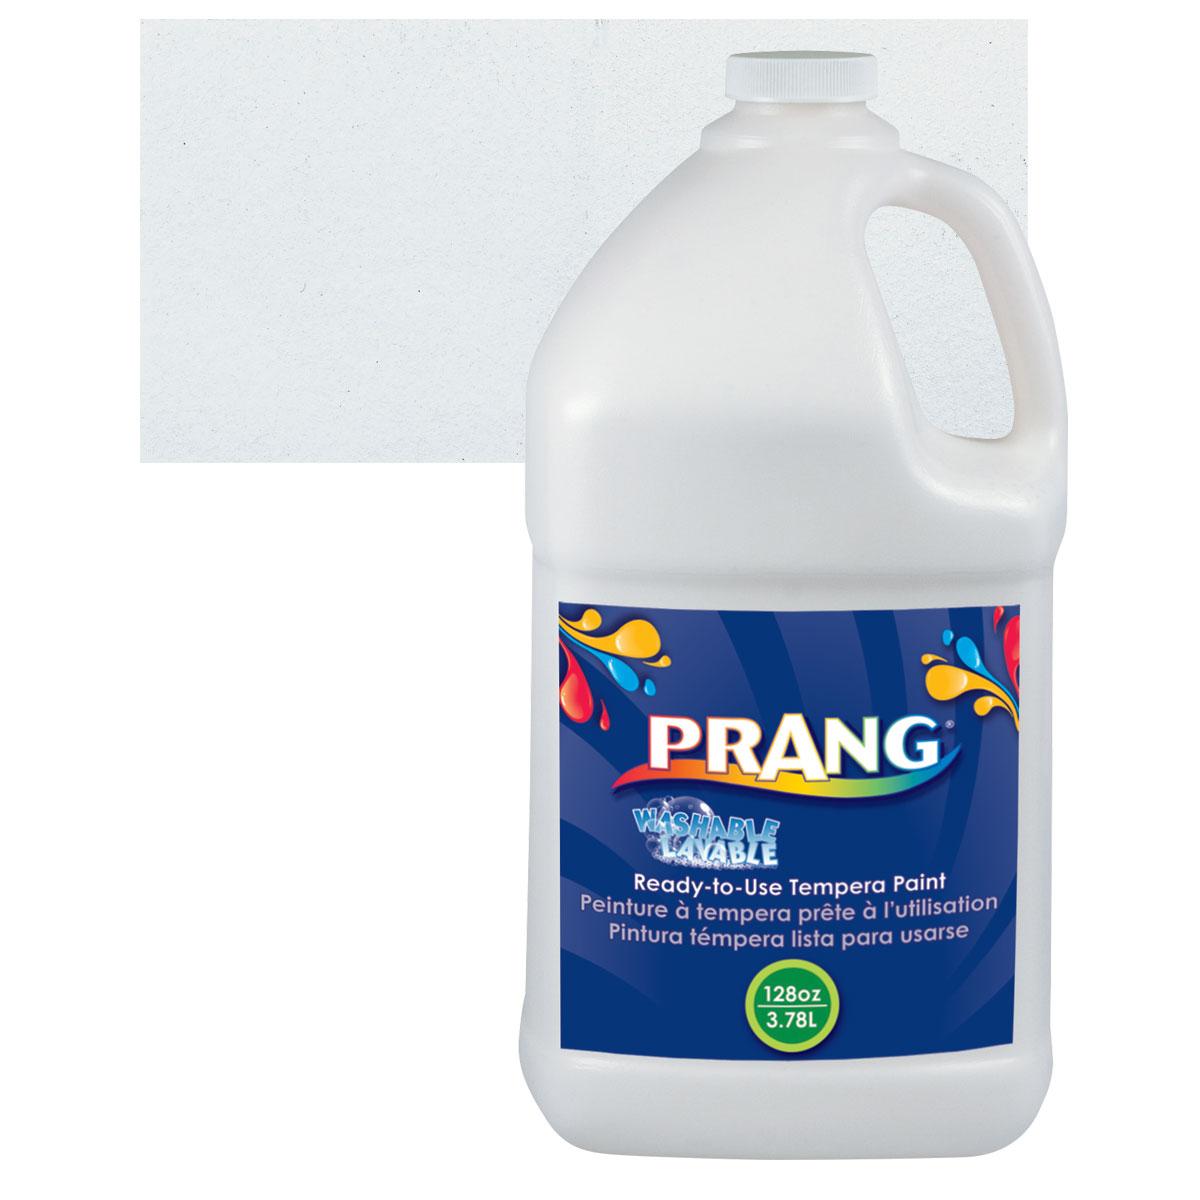 Prang Ready-To-Use Washable Tempera Paint - White, Gallon